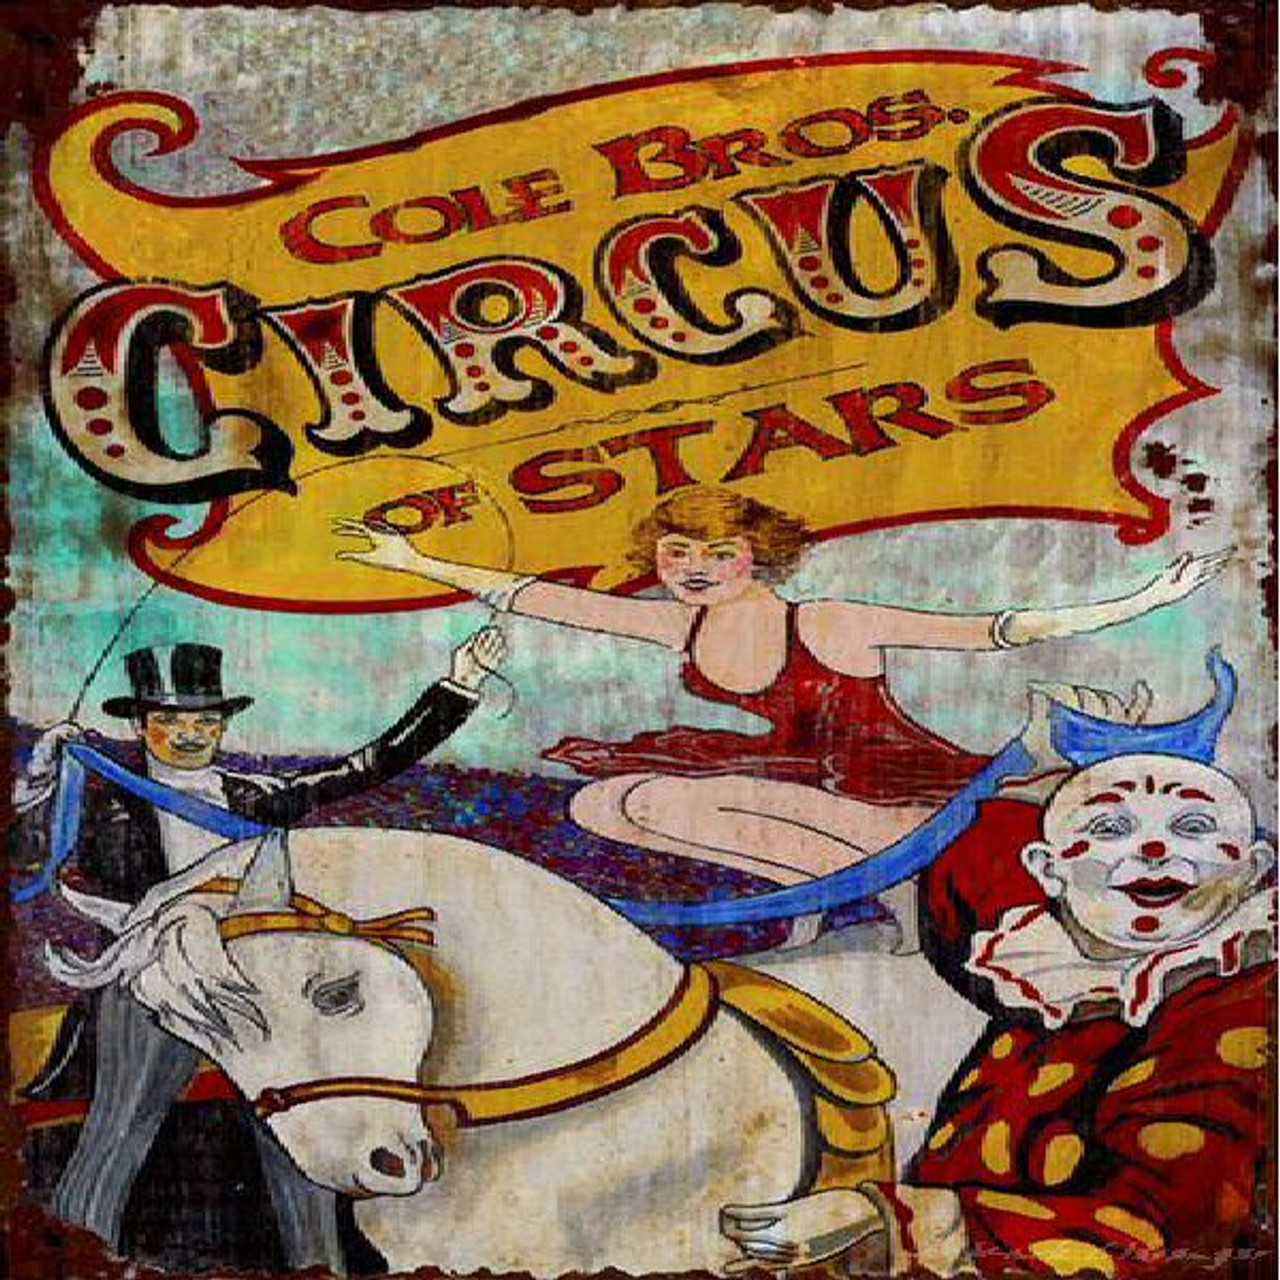 Circus Metal Signs